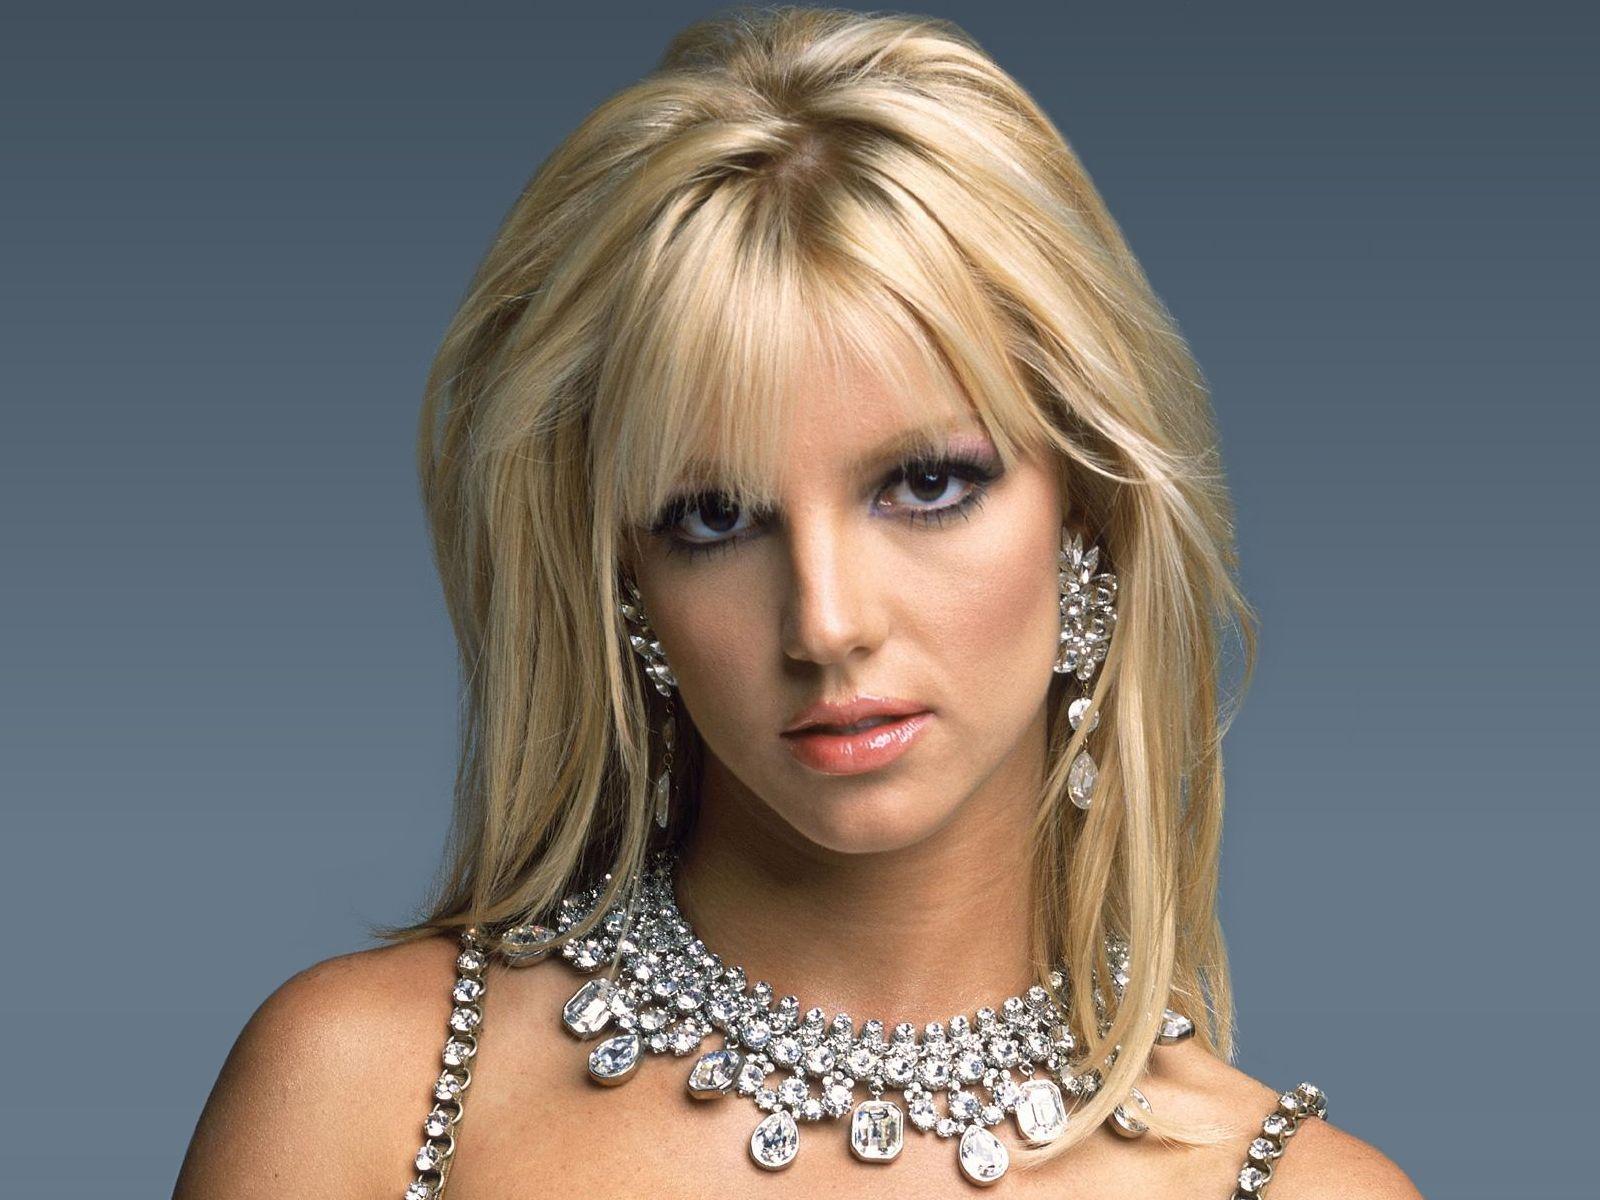 http://4.bp.blogspot.com/-SHSA1ud0foc/To1XWzOvdUI/AAAAAAAAC_A/659clE09EFg/s1600/Britney++spears+01+%2528174%2529.jpg